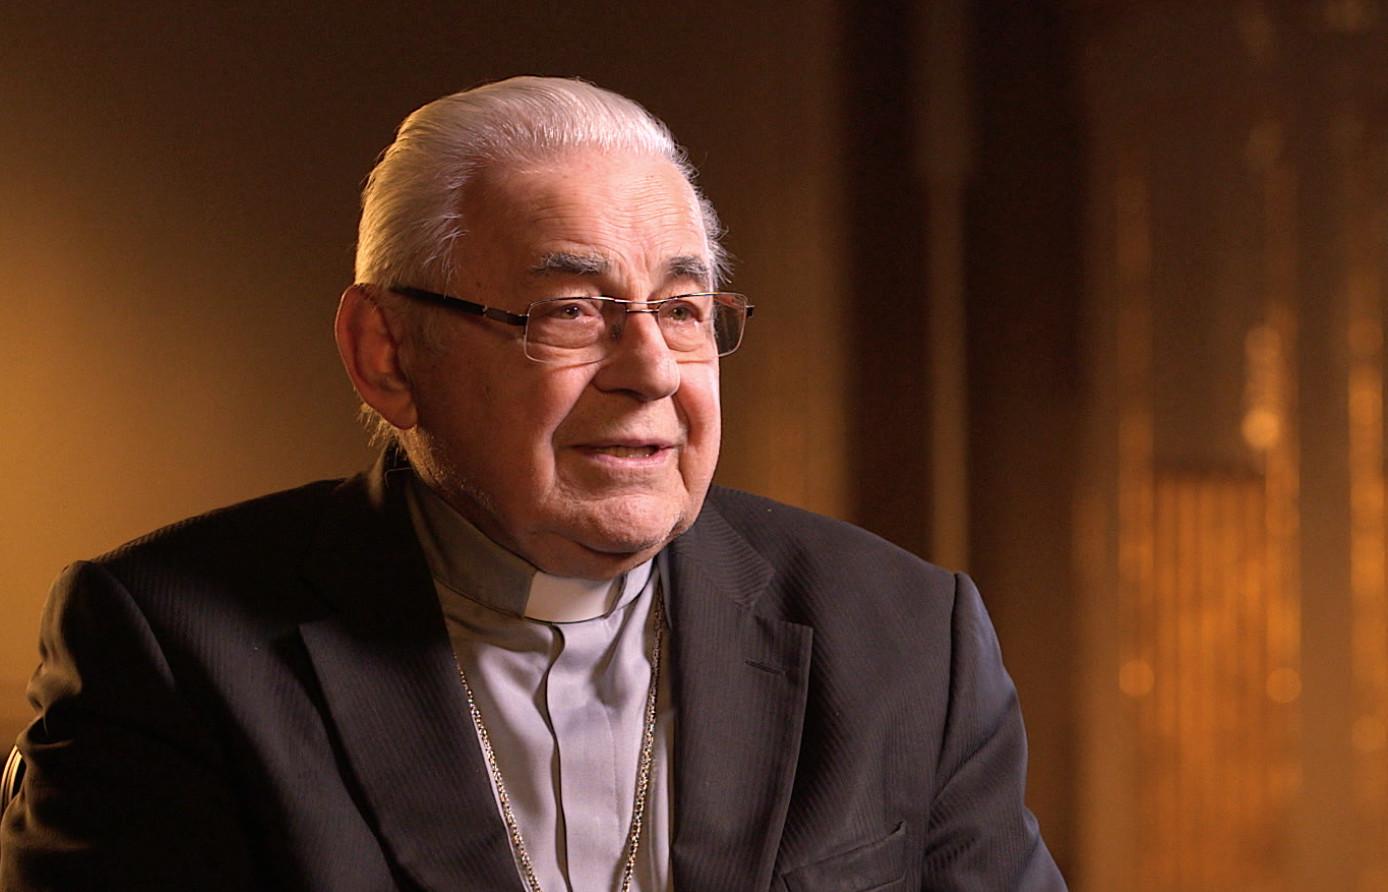 Cardinal Miloslav Vlk, interviewee on John Paul 2: Liberating a Continent, the Fall of Communism.